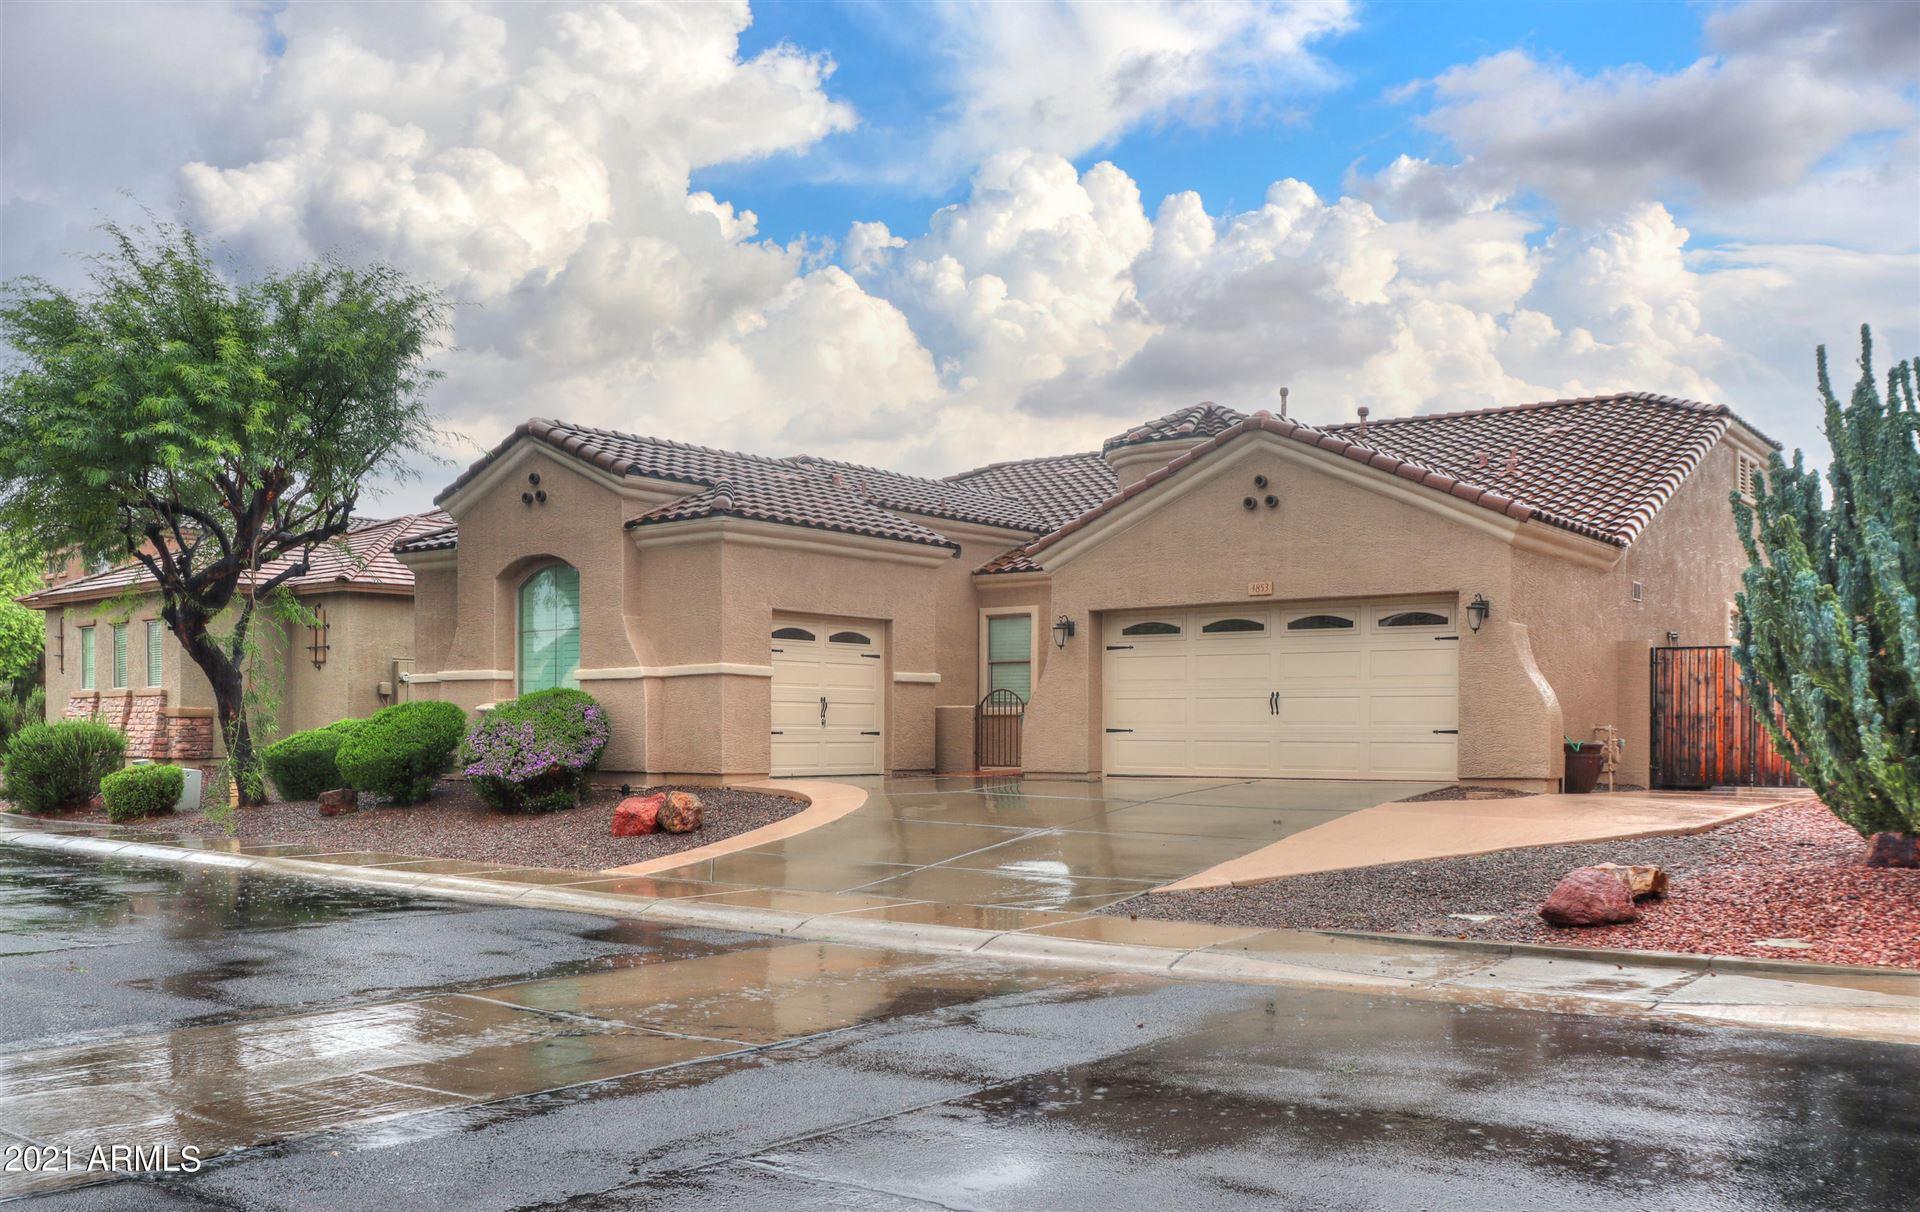 Photo of 3853 S Danielson Way, Chandler, AZ 85286 (MLS # 6269371)